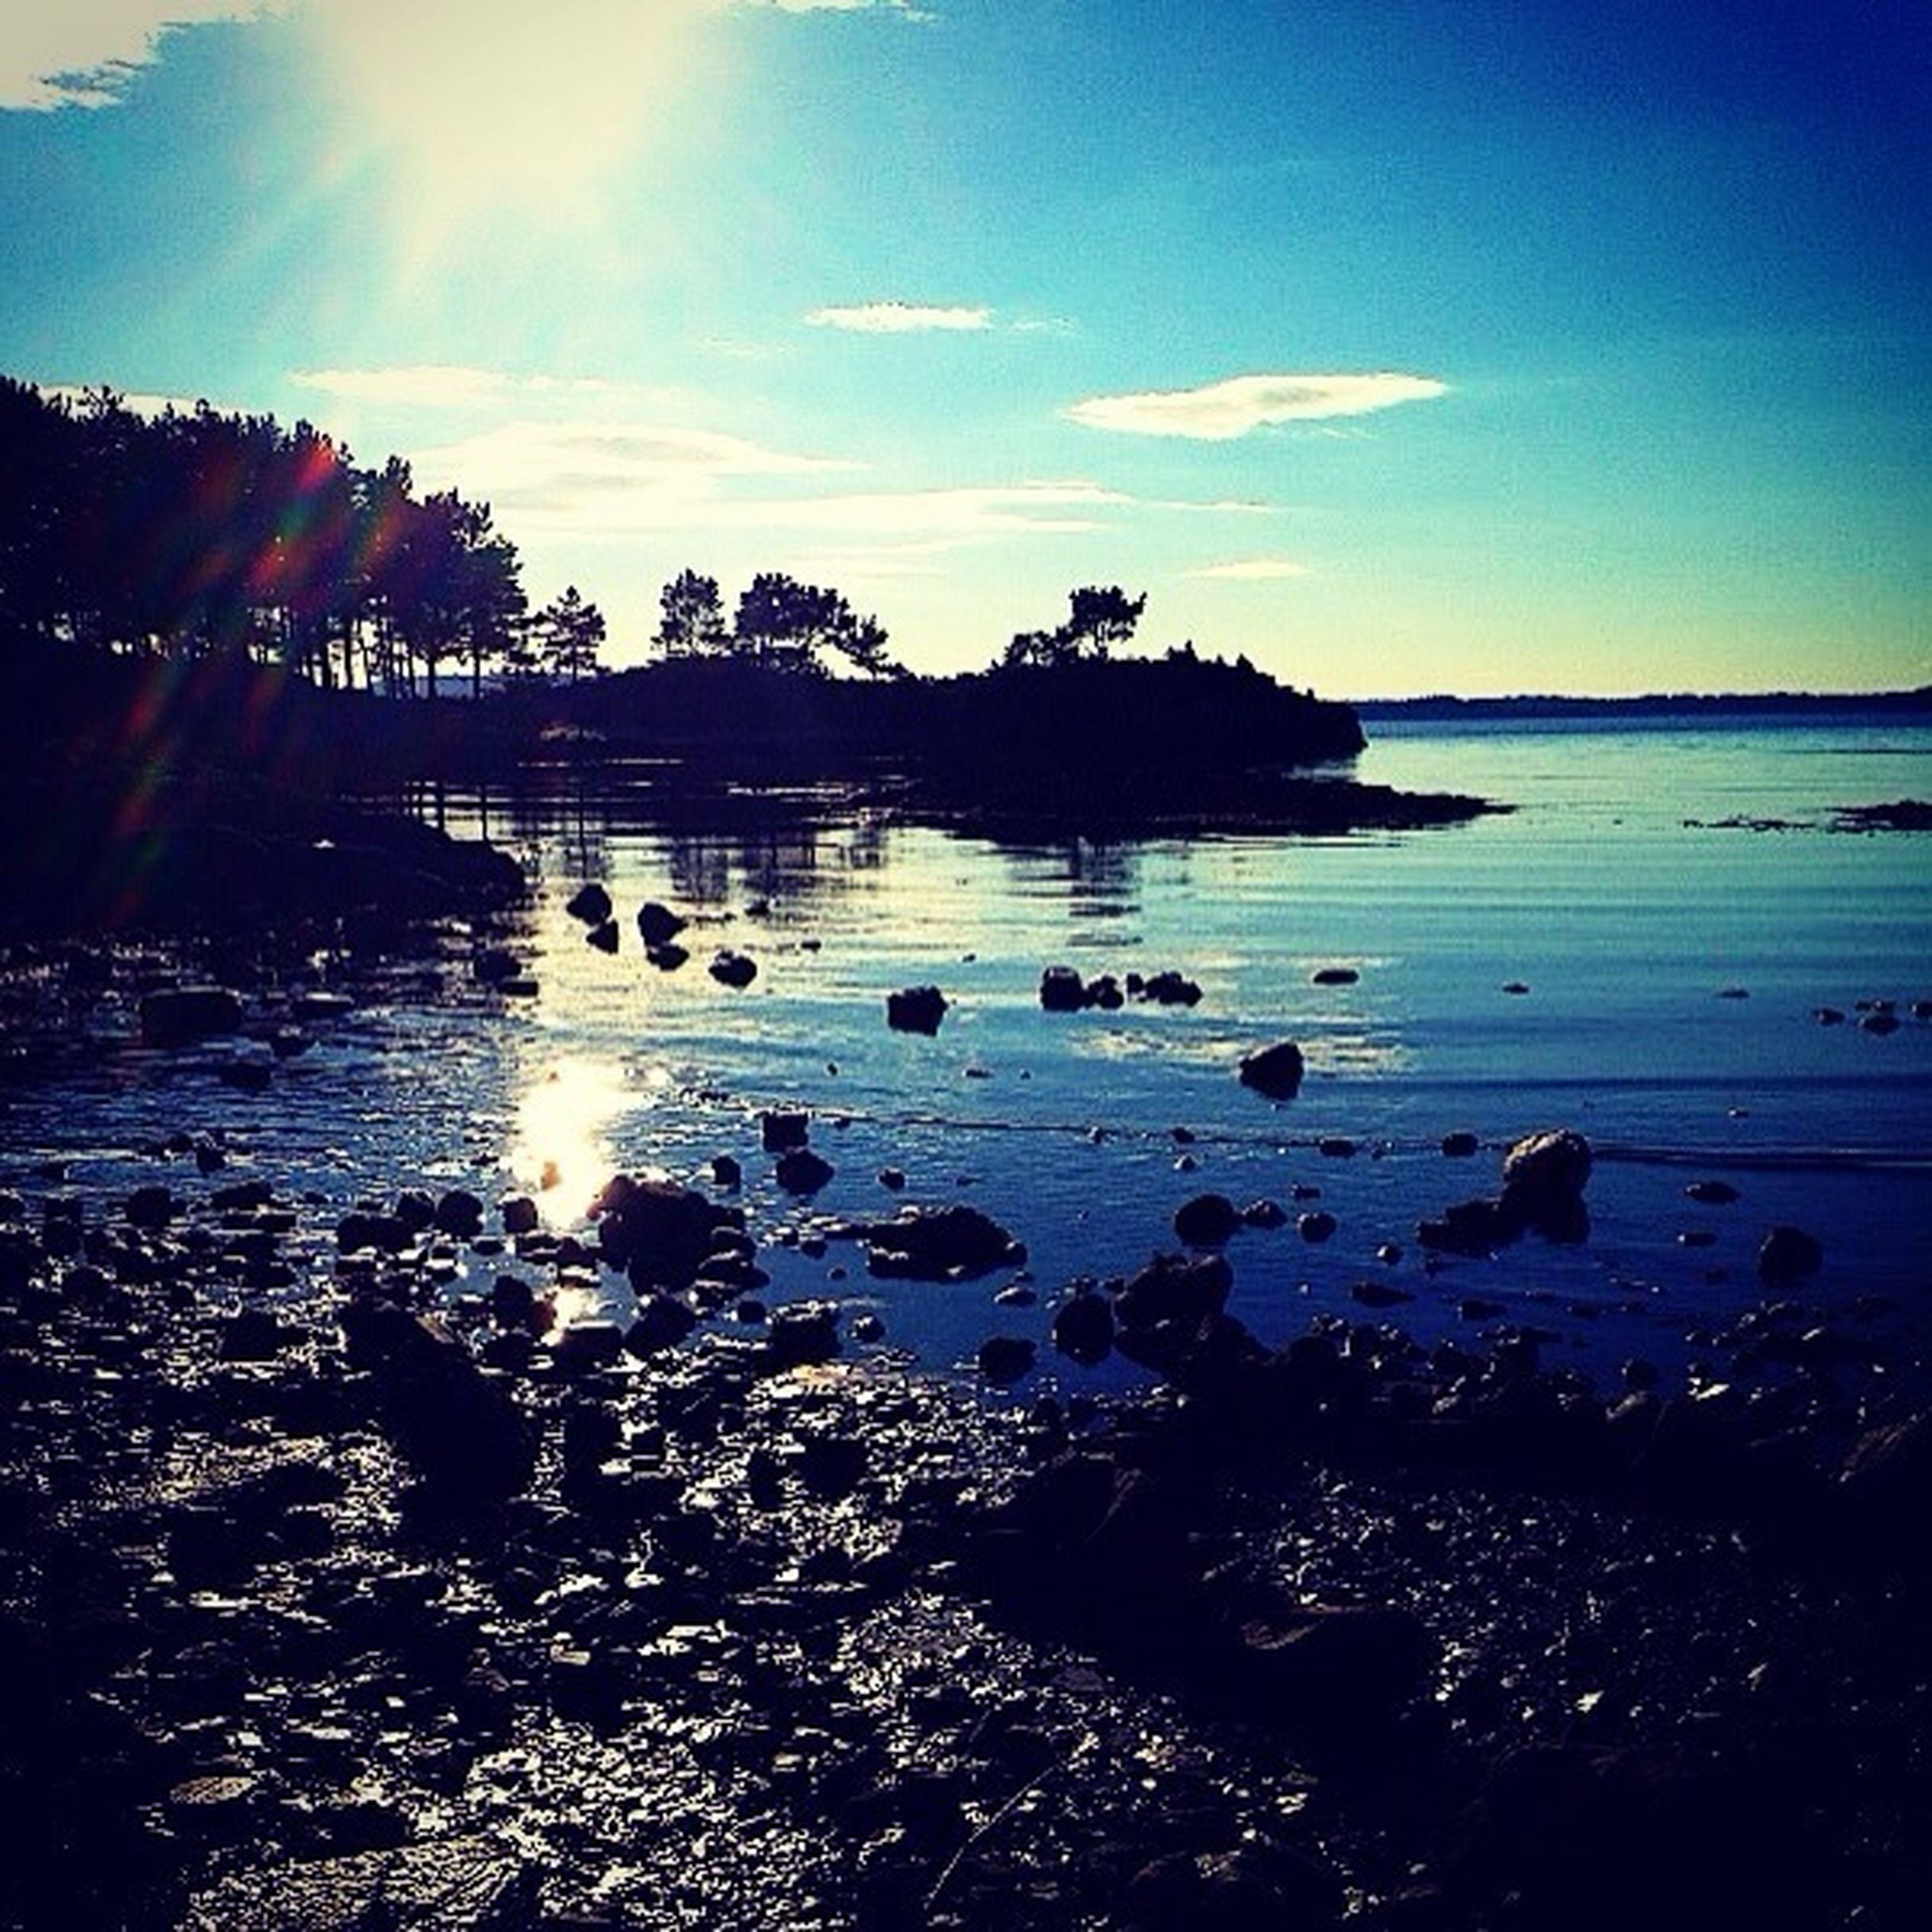 water, sea, beach, sky, tranquil scene, shore, scenics, tranquility, sunset, beauty in nature, sun, reflection, horizon over water, sunlight, nature, silhouette, idyllic, sunbeam, sand, coastline